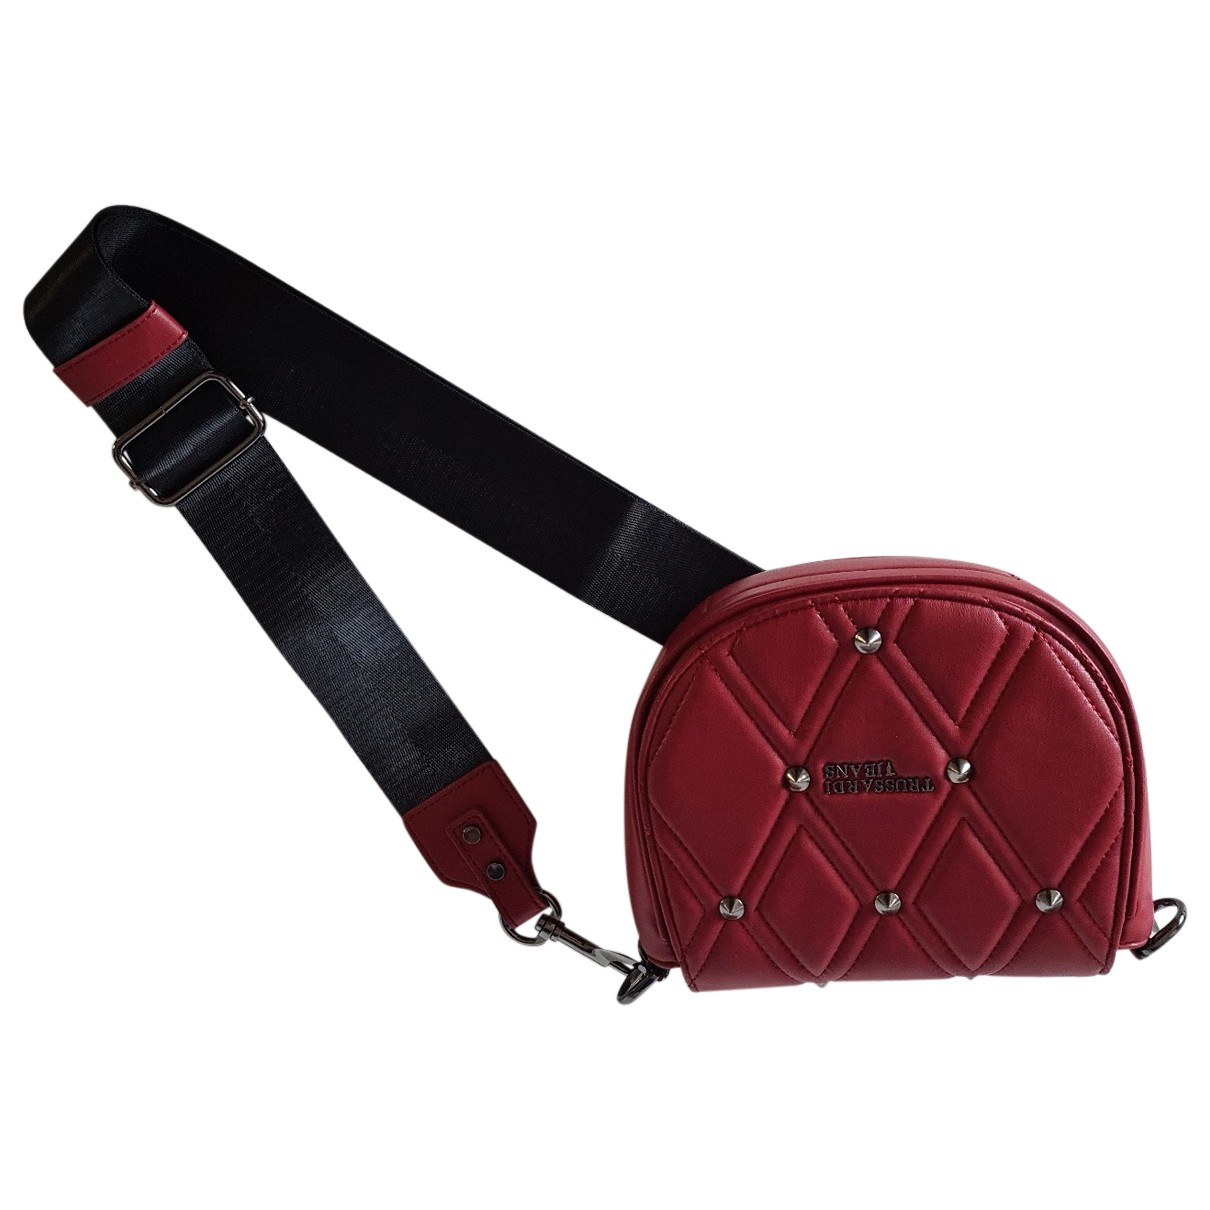 Bolsos clutch en Sintetico Rojo Trussardi Jeans